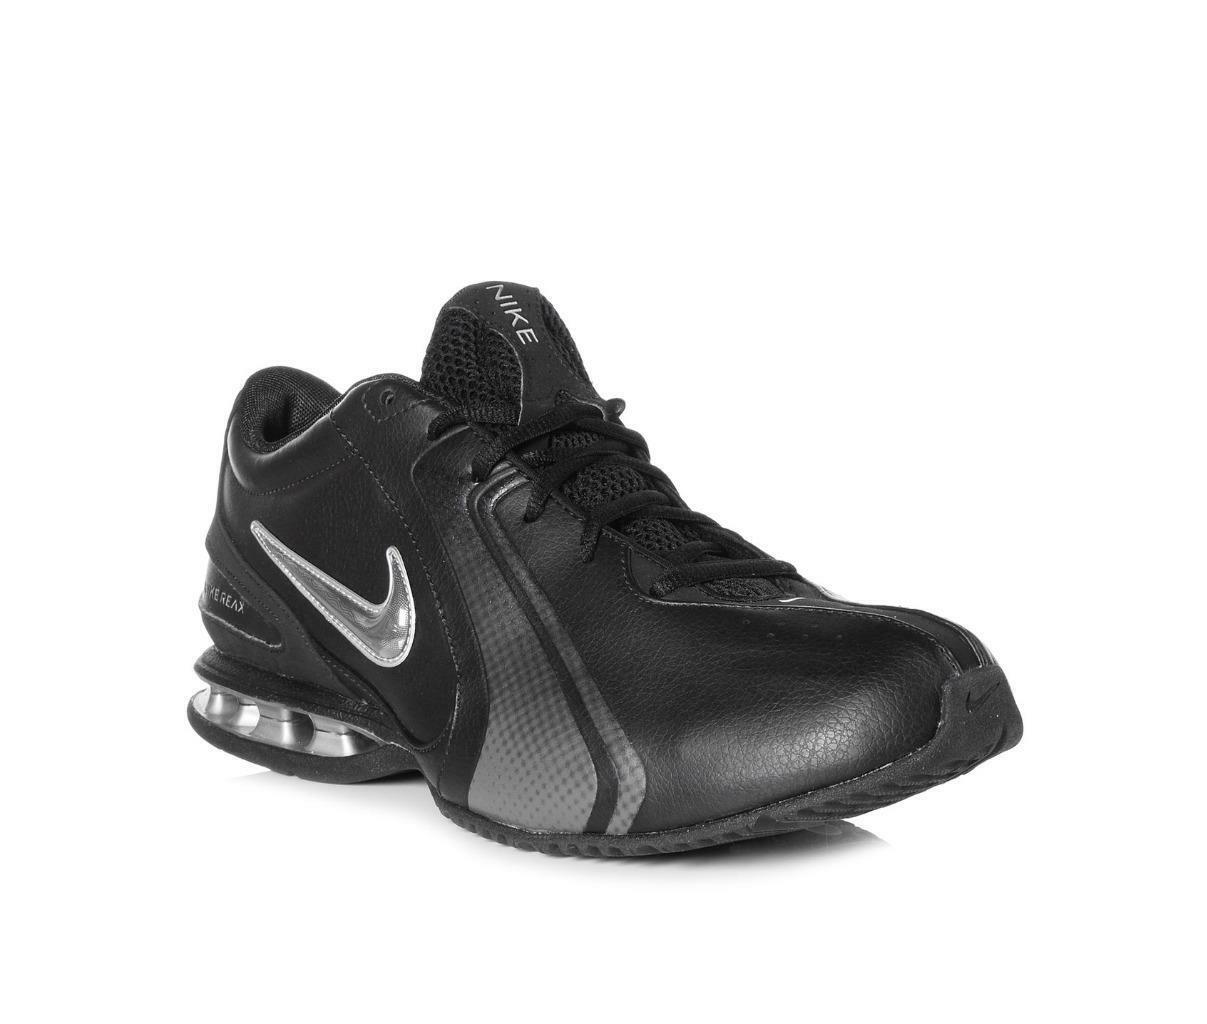 NIKE REAX TR III SL Men's Training shoes Black 333765 001 NEW IN BOX